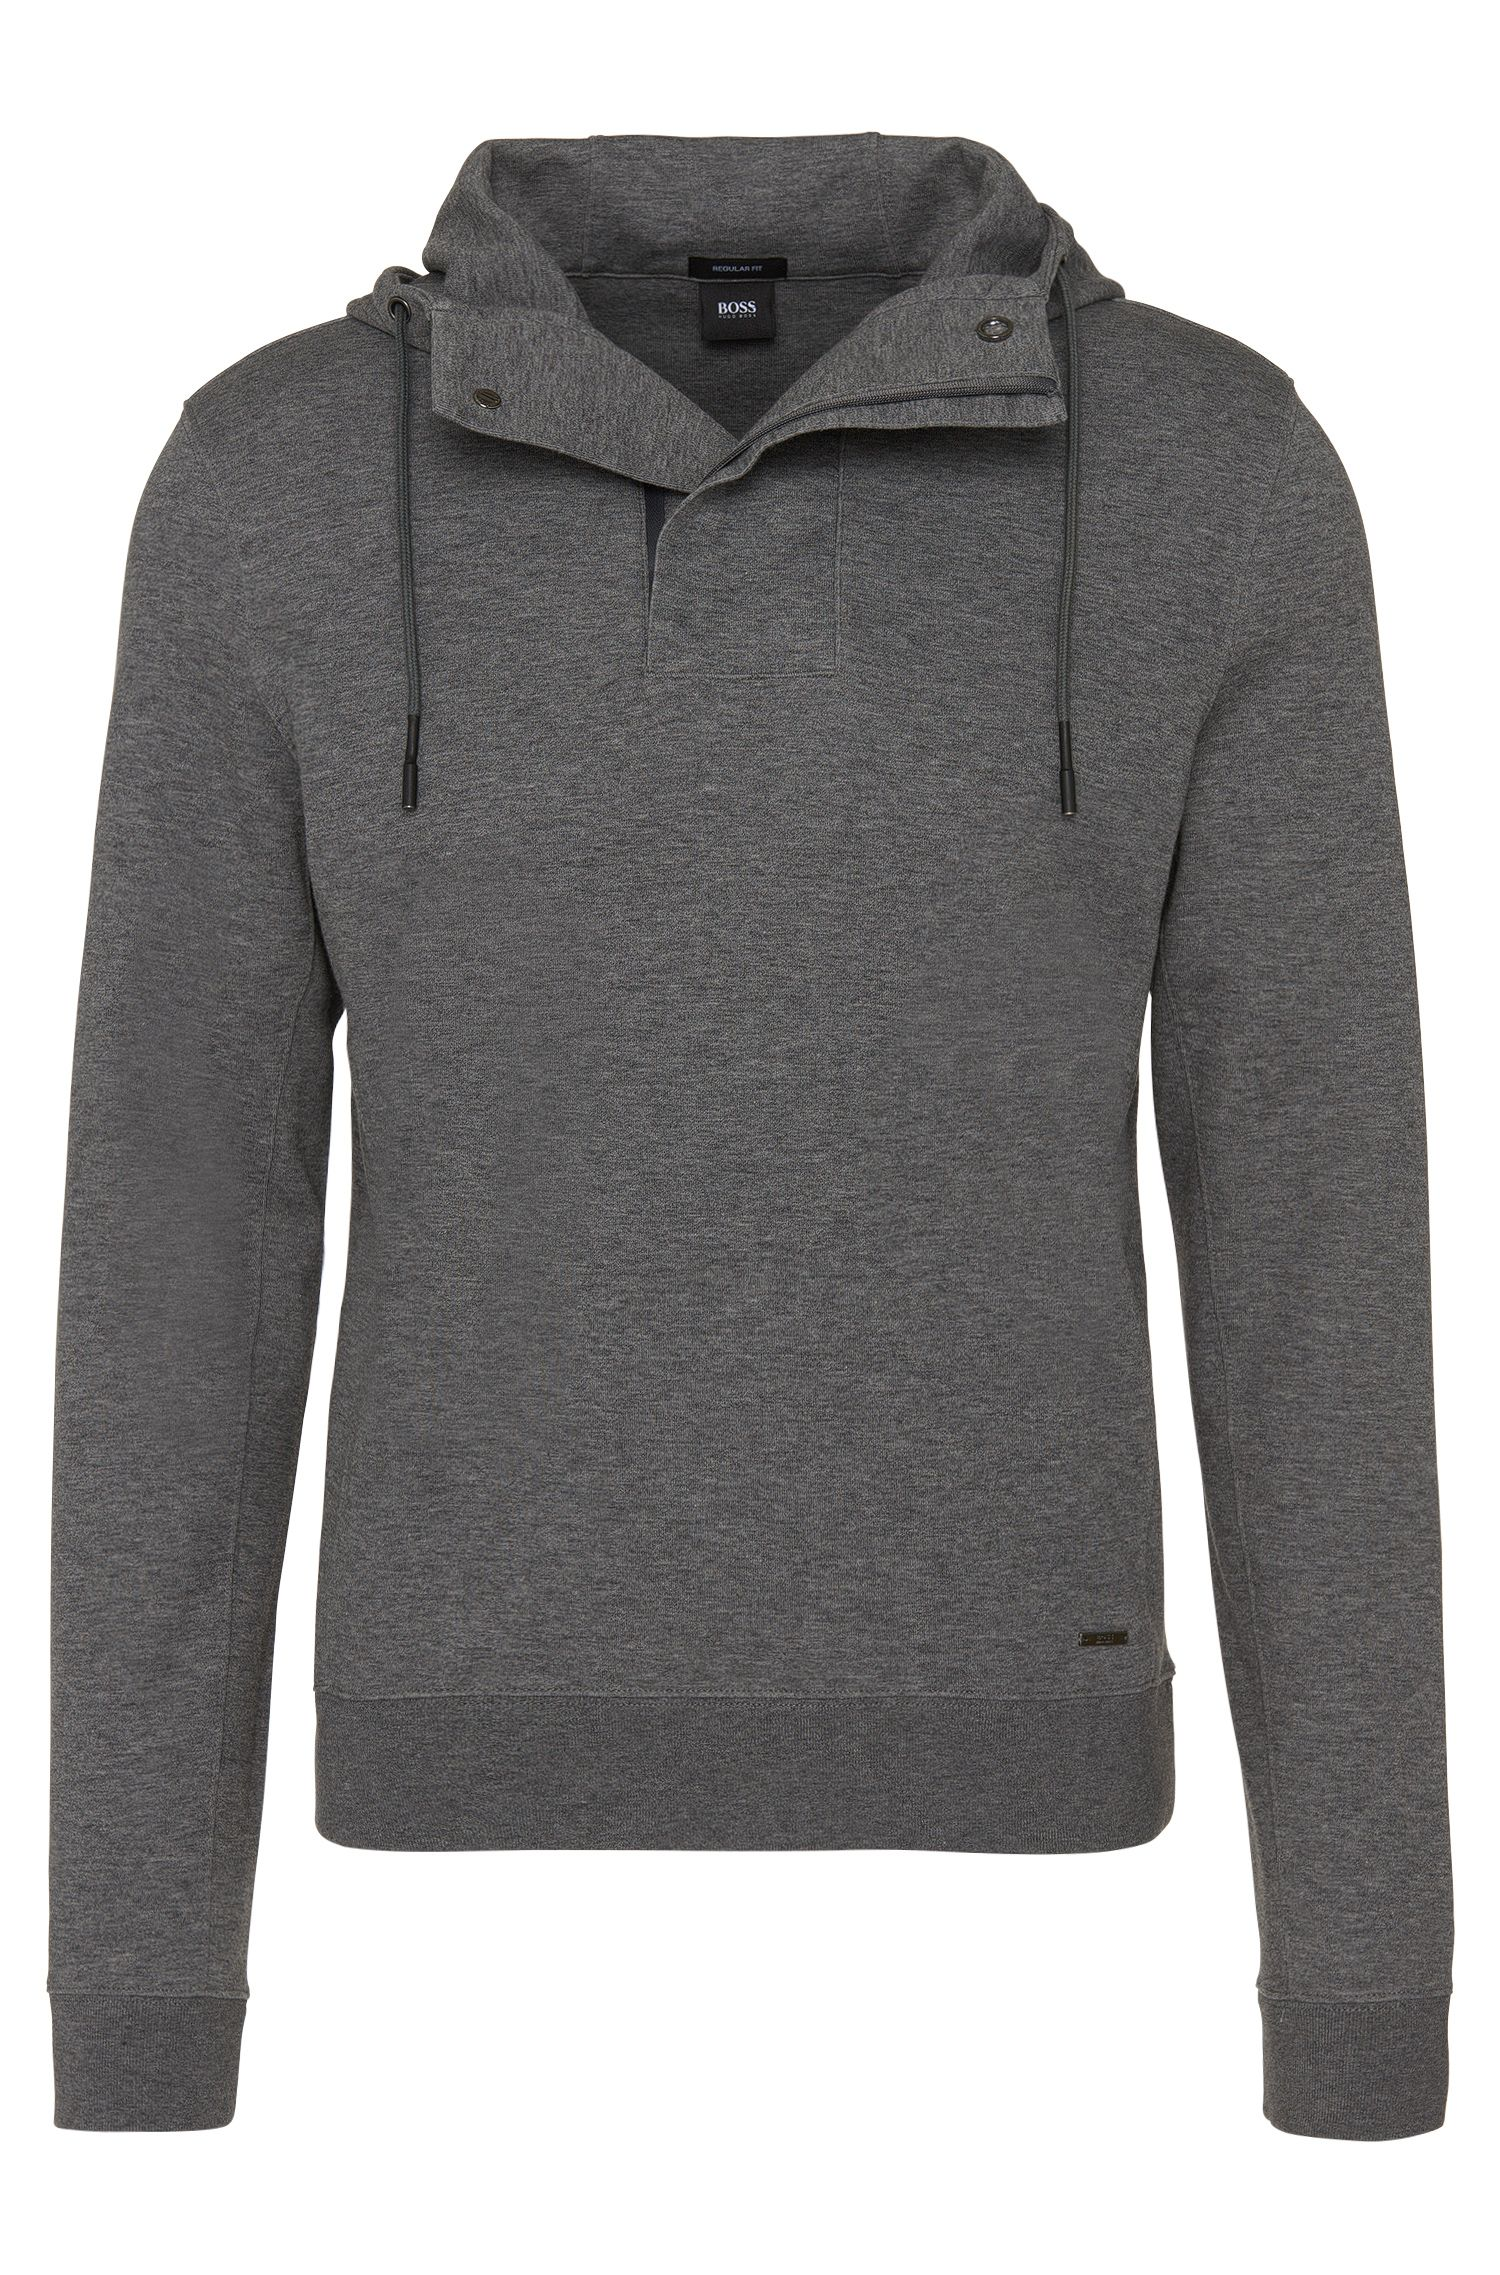 Regular-Fit Kapuzen-Sweatshirt aus Baumwoll-Mix: 'Seeger 02'